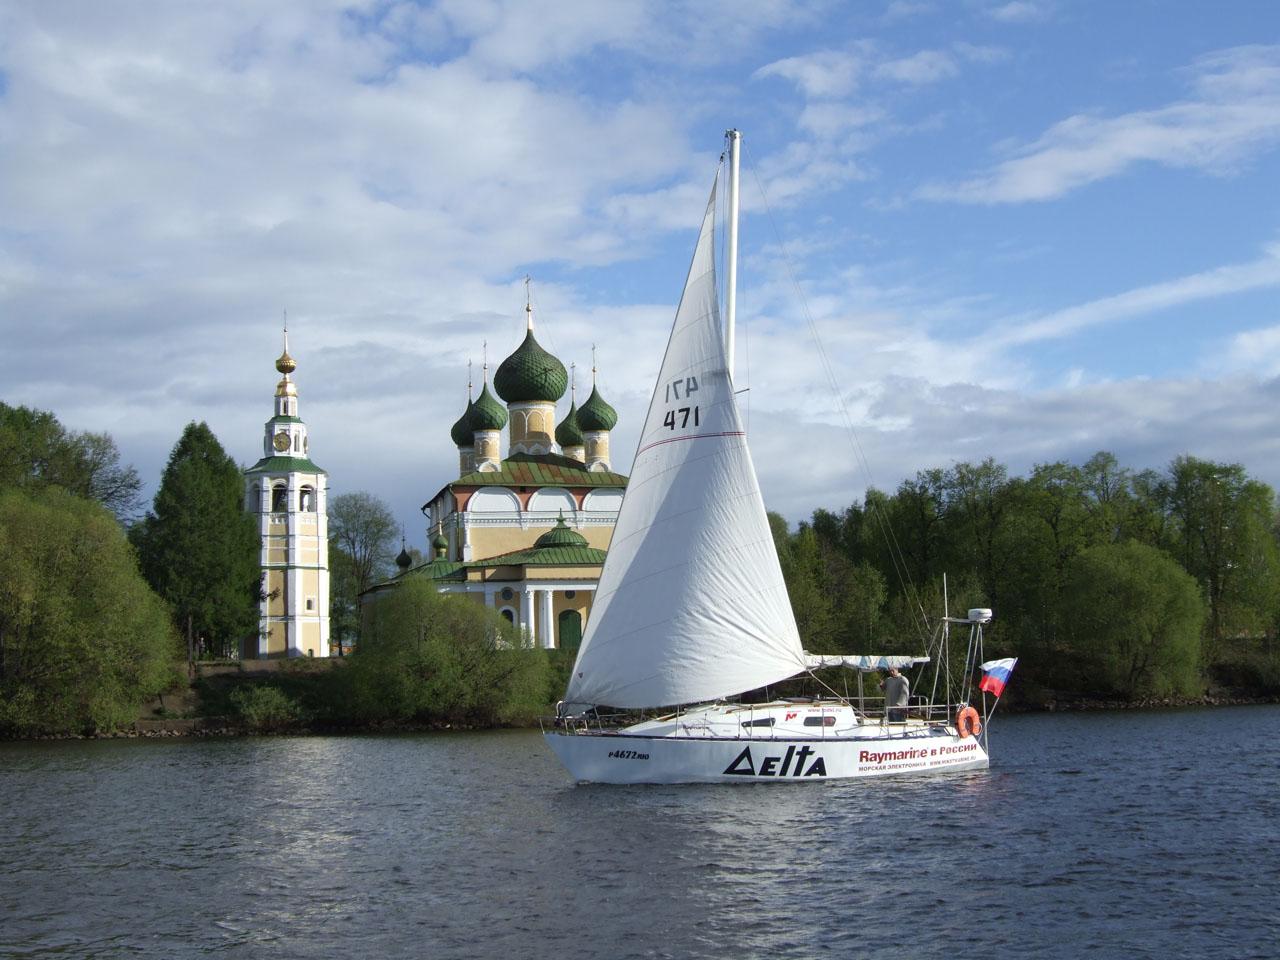 yacht Delta